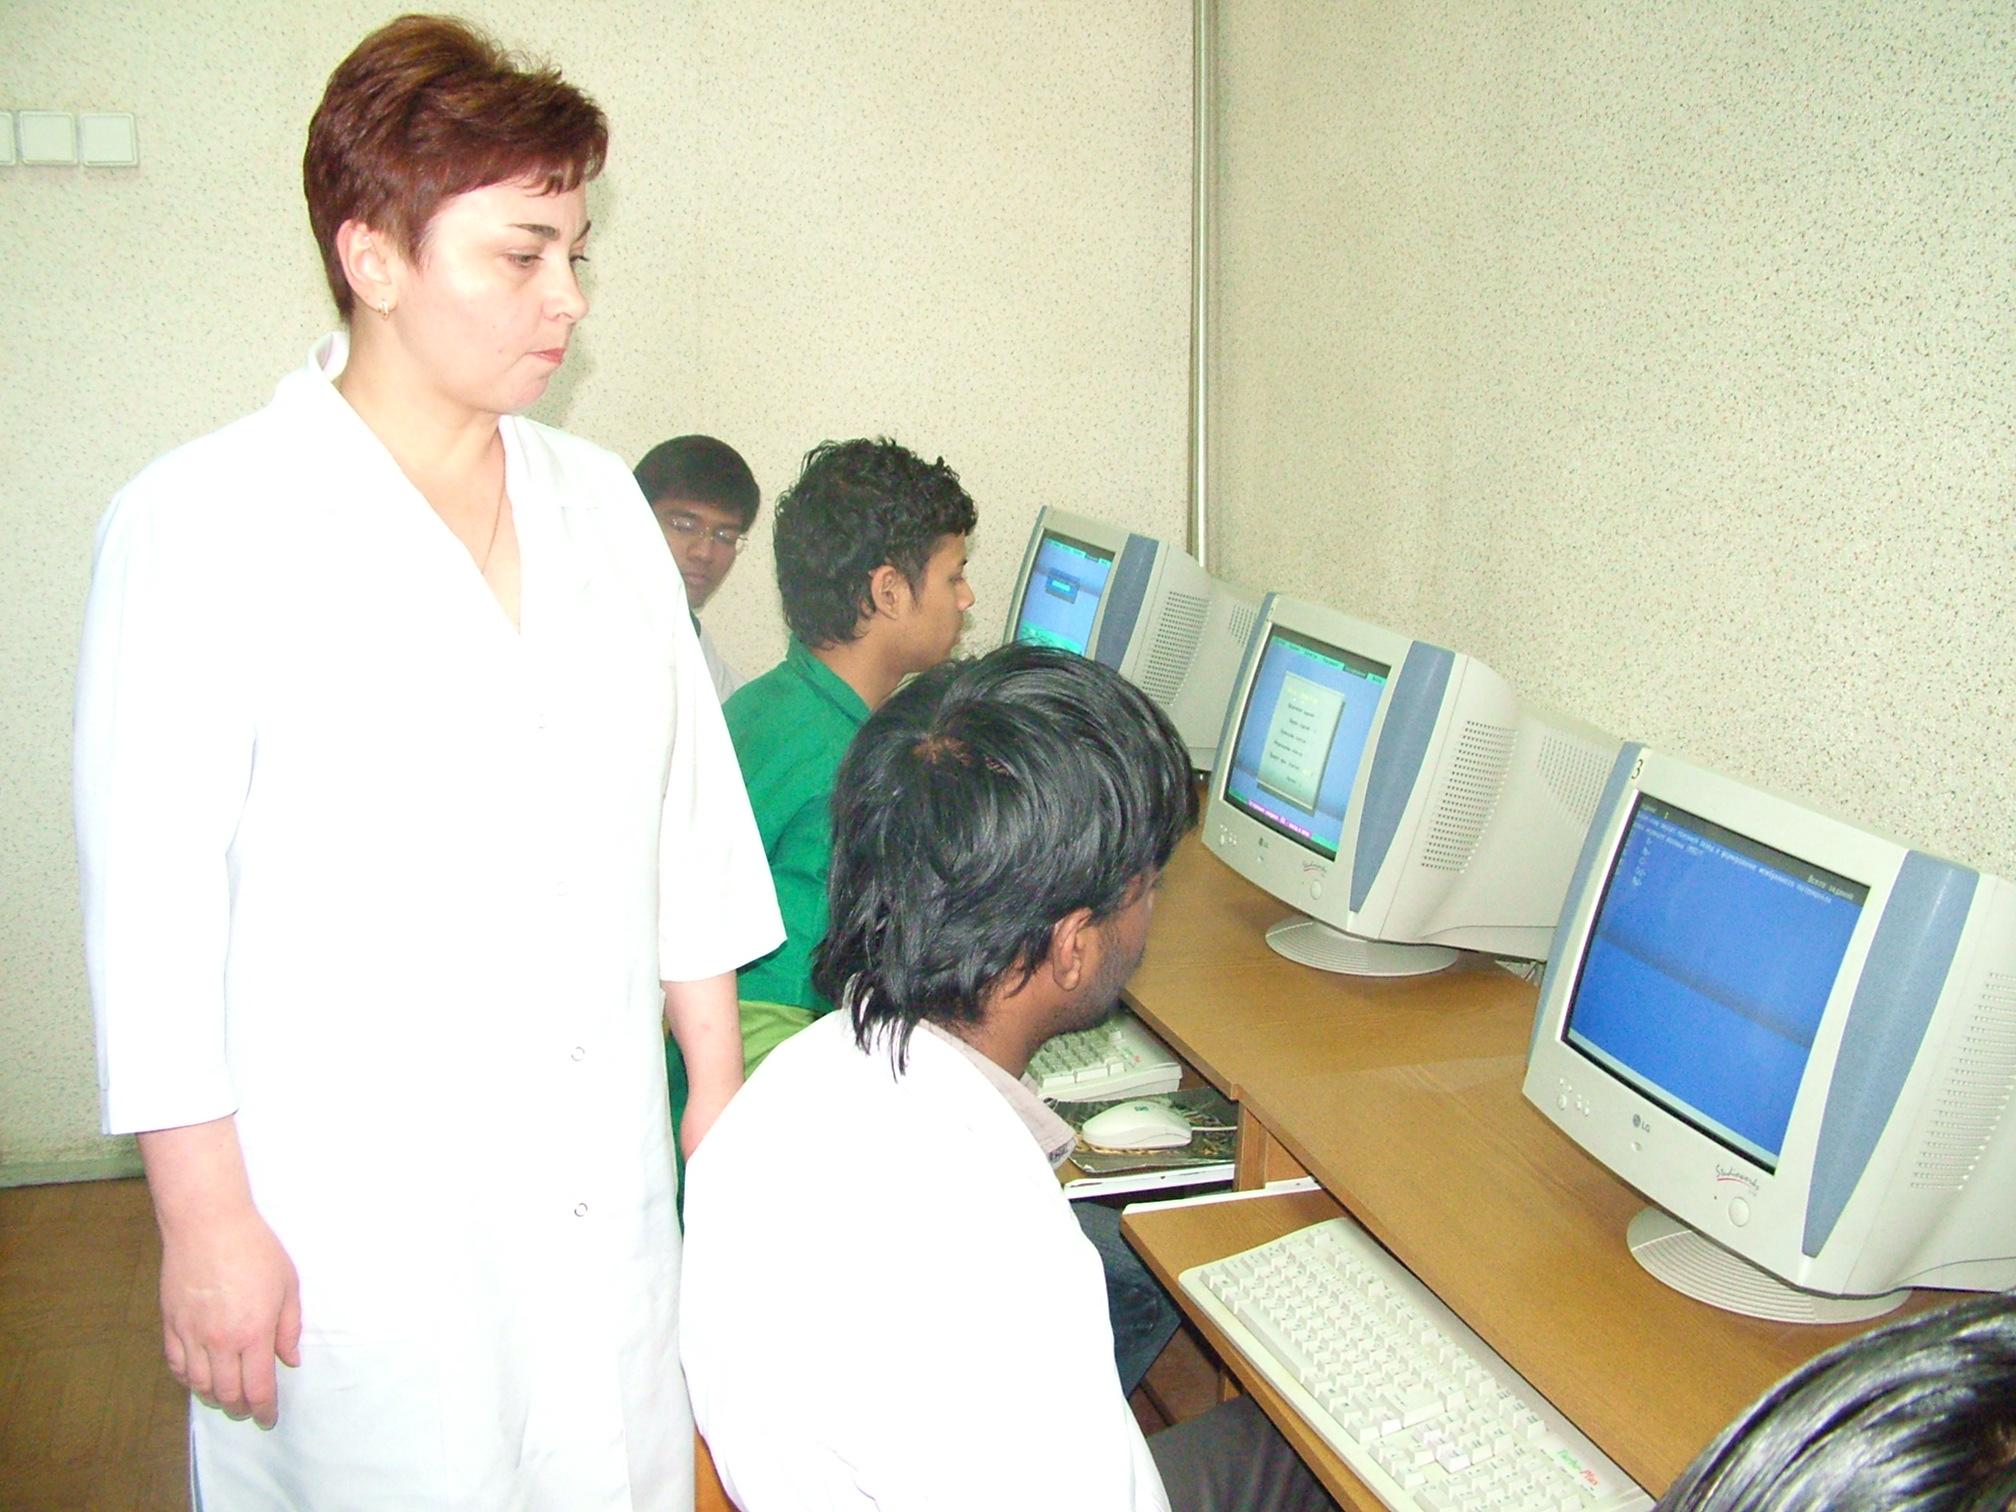 журнал физиология человека 2008